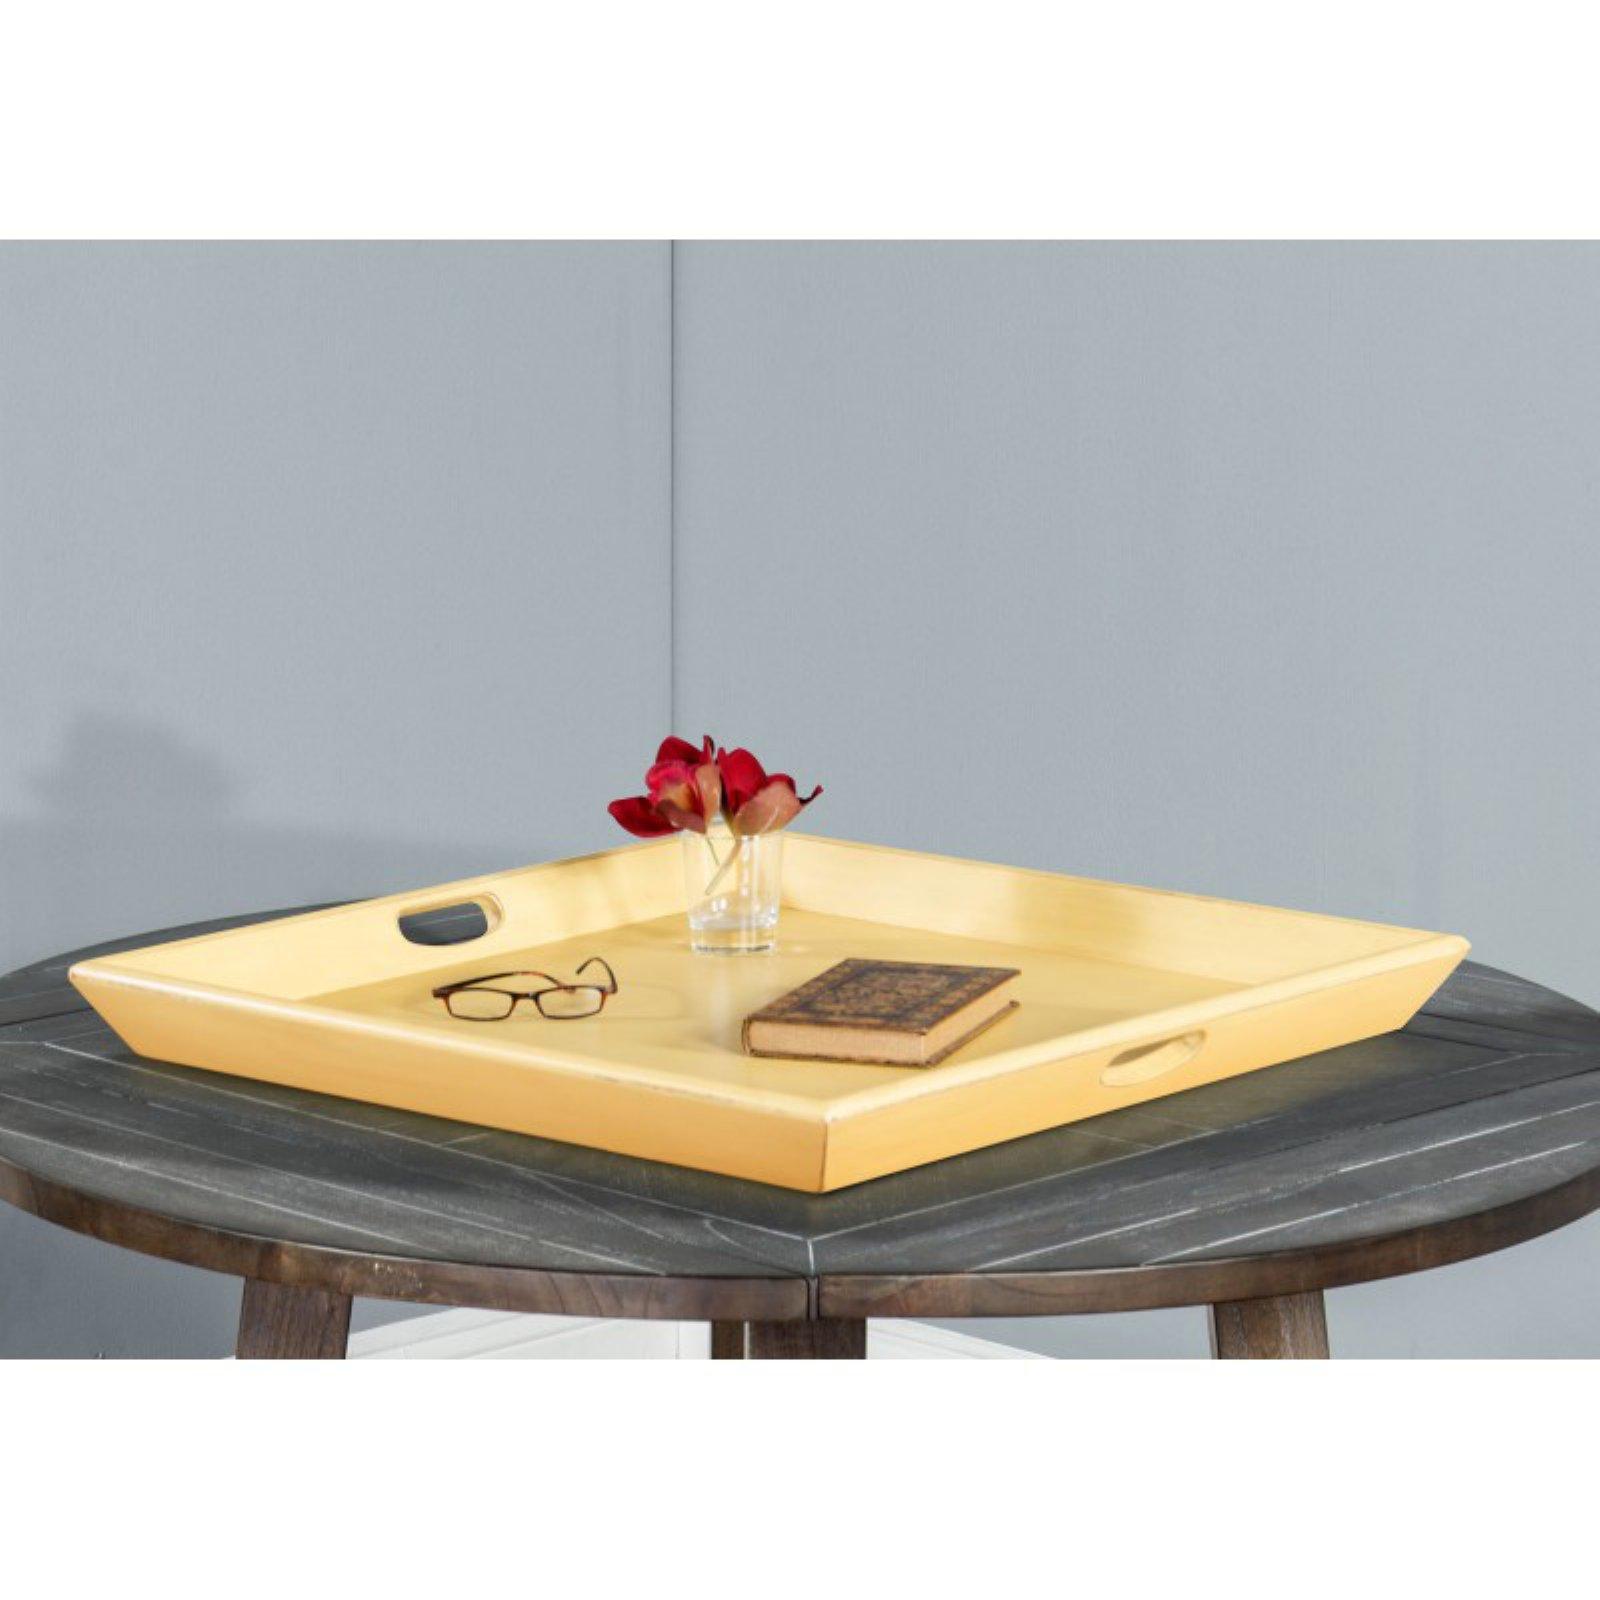 Sunny Designs Ottoman Tray